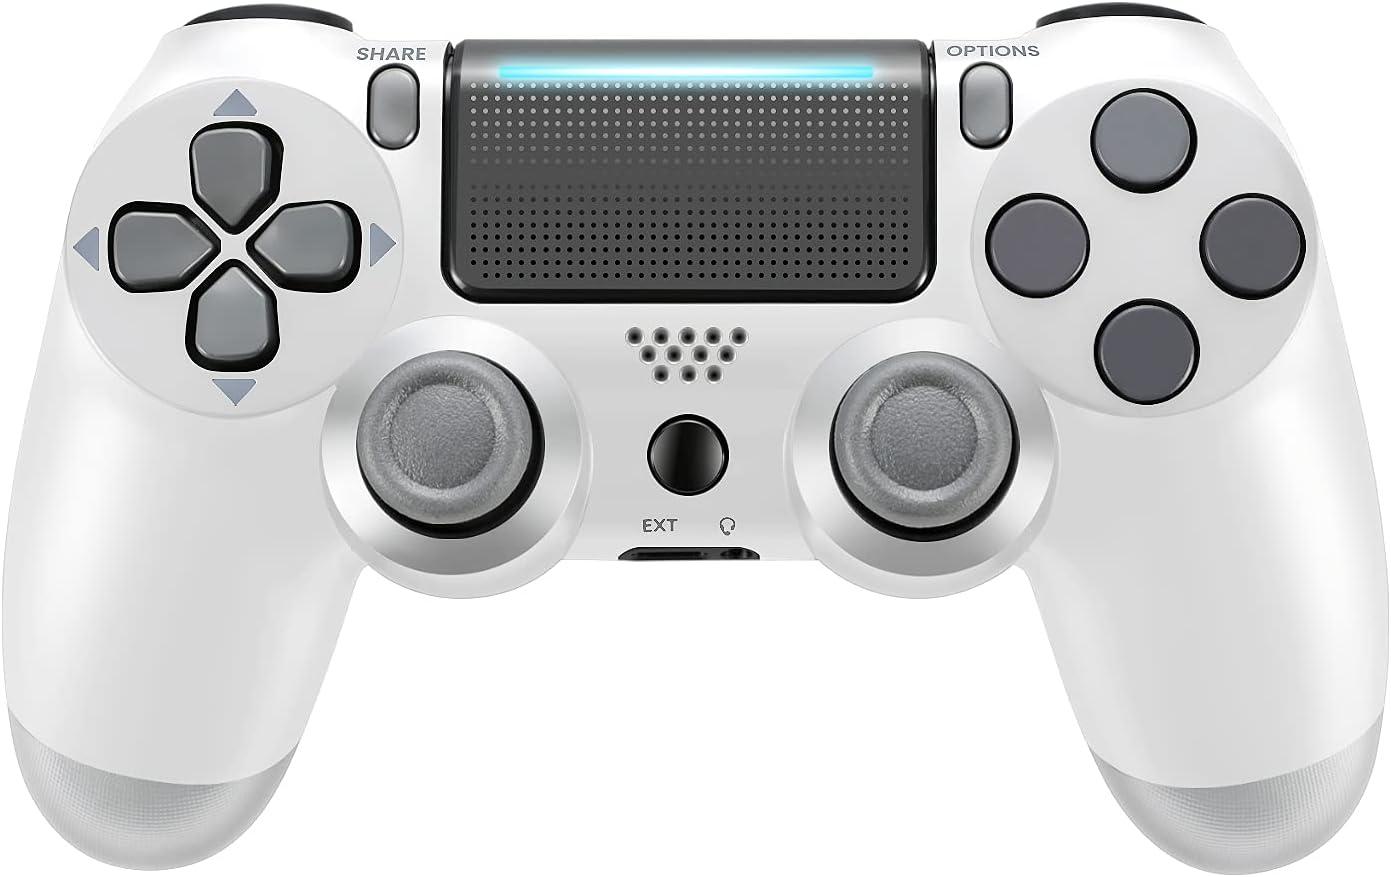 Medvoe Wireless Game Controller for Manufacturer OFFicial Dedication shop PS4 Batter 1000mAh Built-in